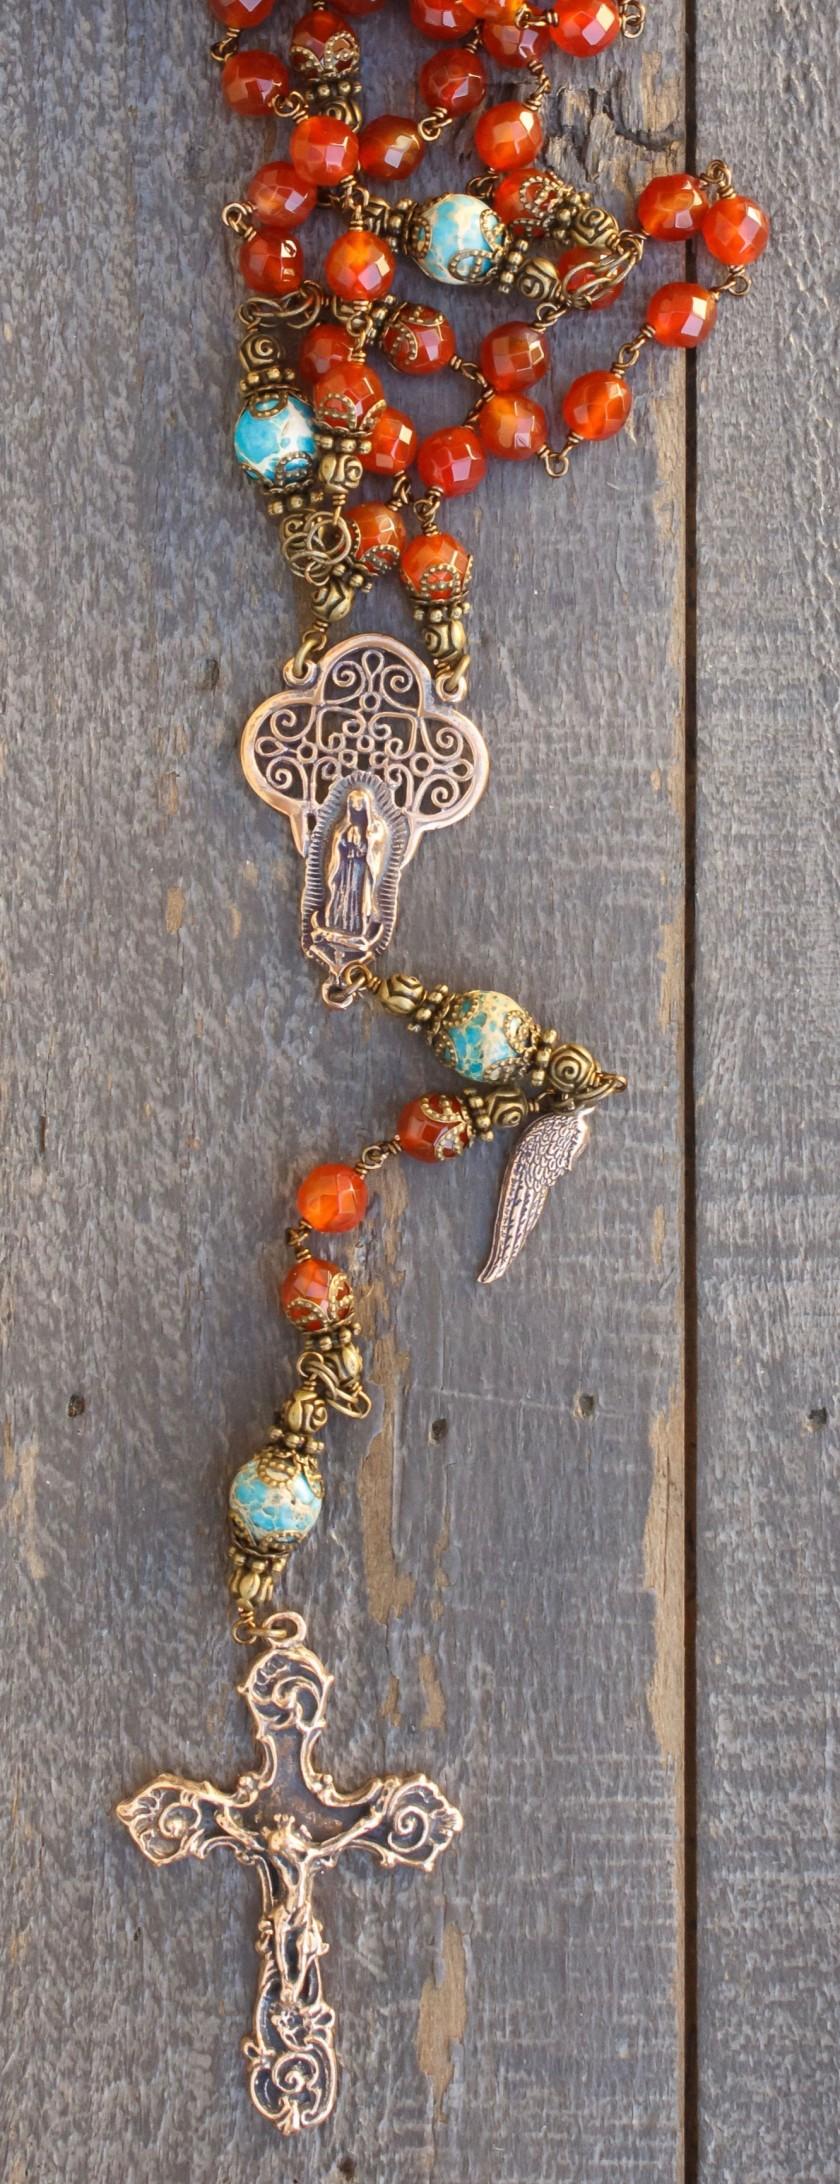 Faceted Carnelian Quartz Heirloom Rosary